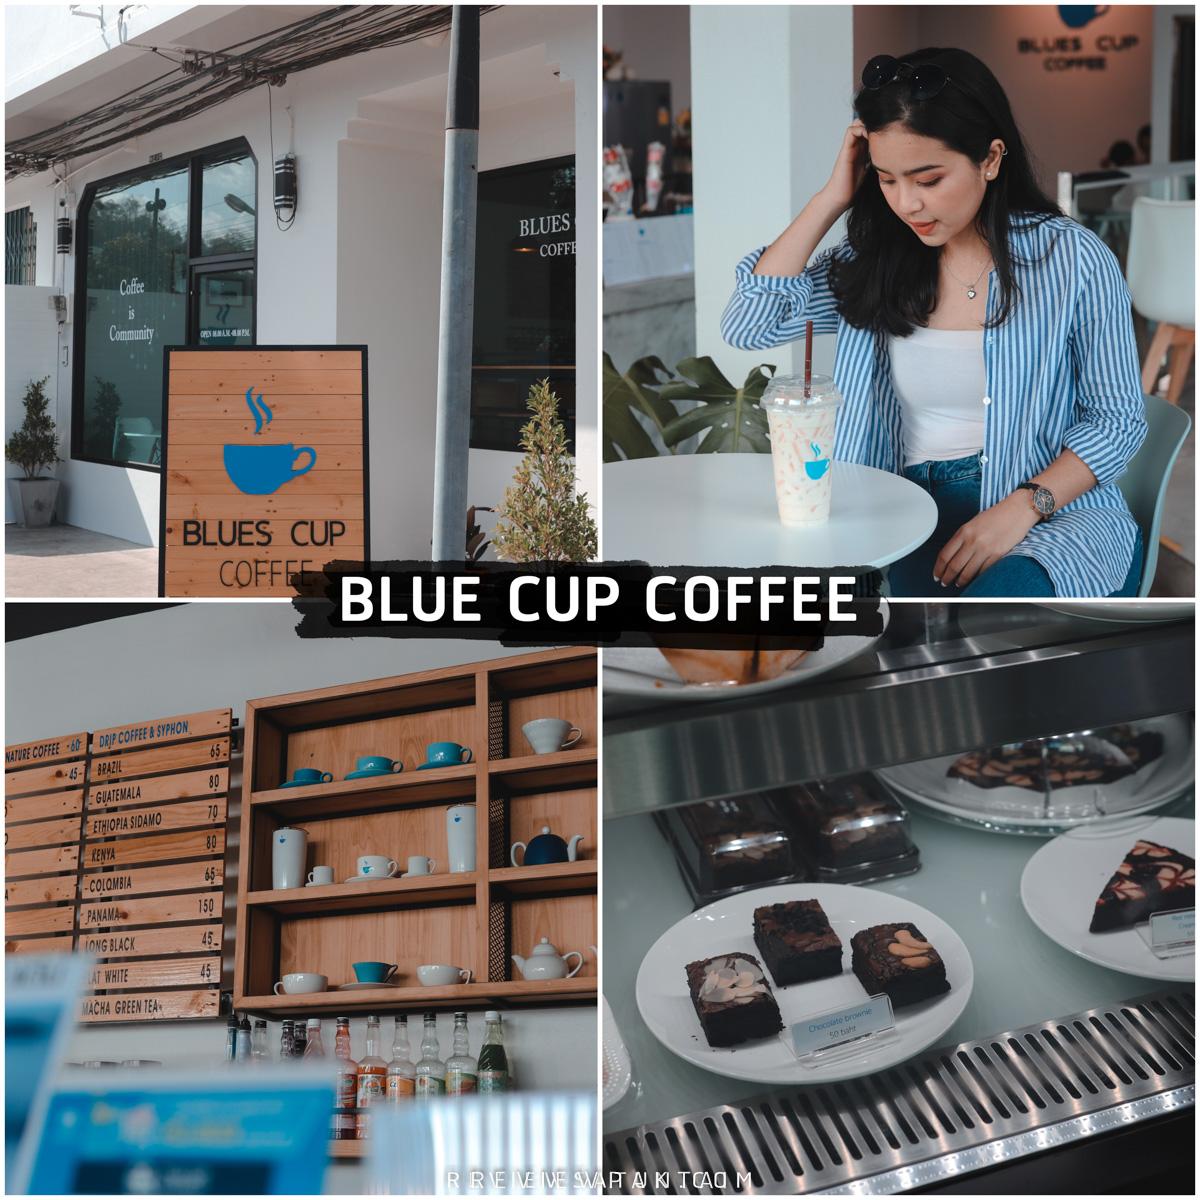 Blue Cup coffee คาเฟ่โทนสีฟ้าปนขาว ร้านนั่งสบายๆฟิน เครื่องดื่มเบเกอรี่อร่อย 10/10 รายละเอียด คลิก จุดเช็คอิน,หลีเป๊ะ,สตูลสดยกกำลังสาม,satunwonderland,เที่ยวเมืองไทยAmazingกว่าเดิม,ชีพจรลงSouth